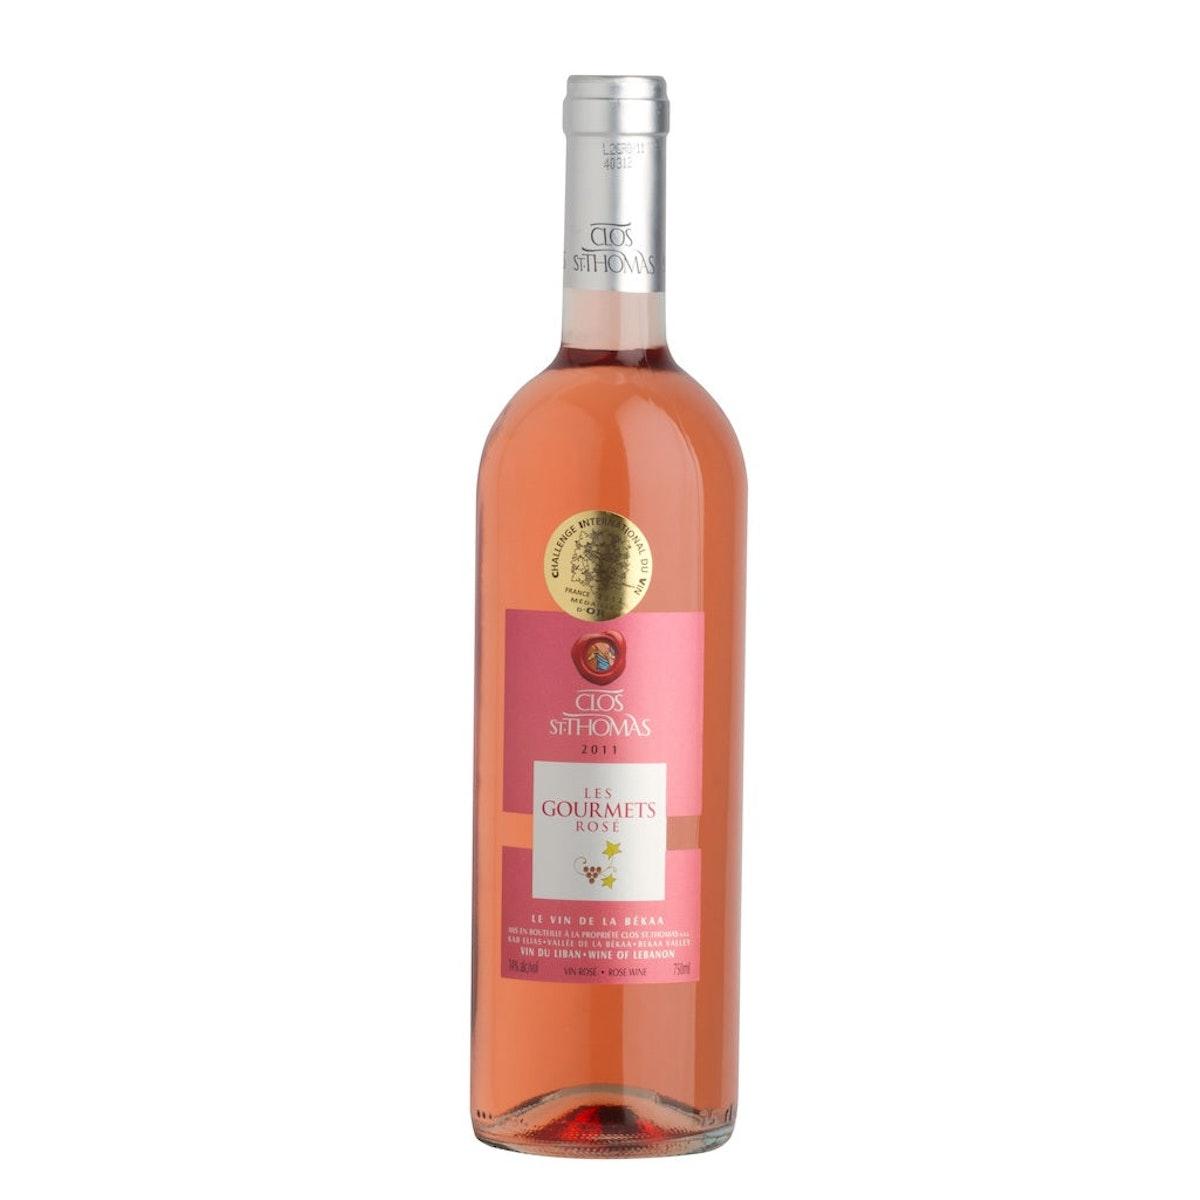 'Les Gourmets rosé'